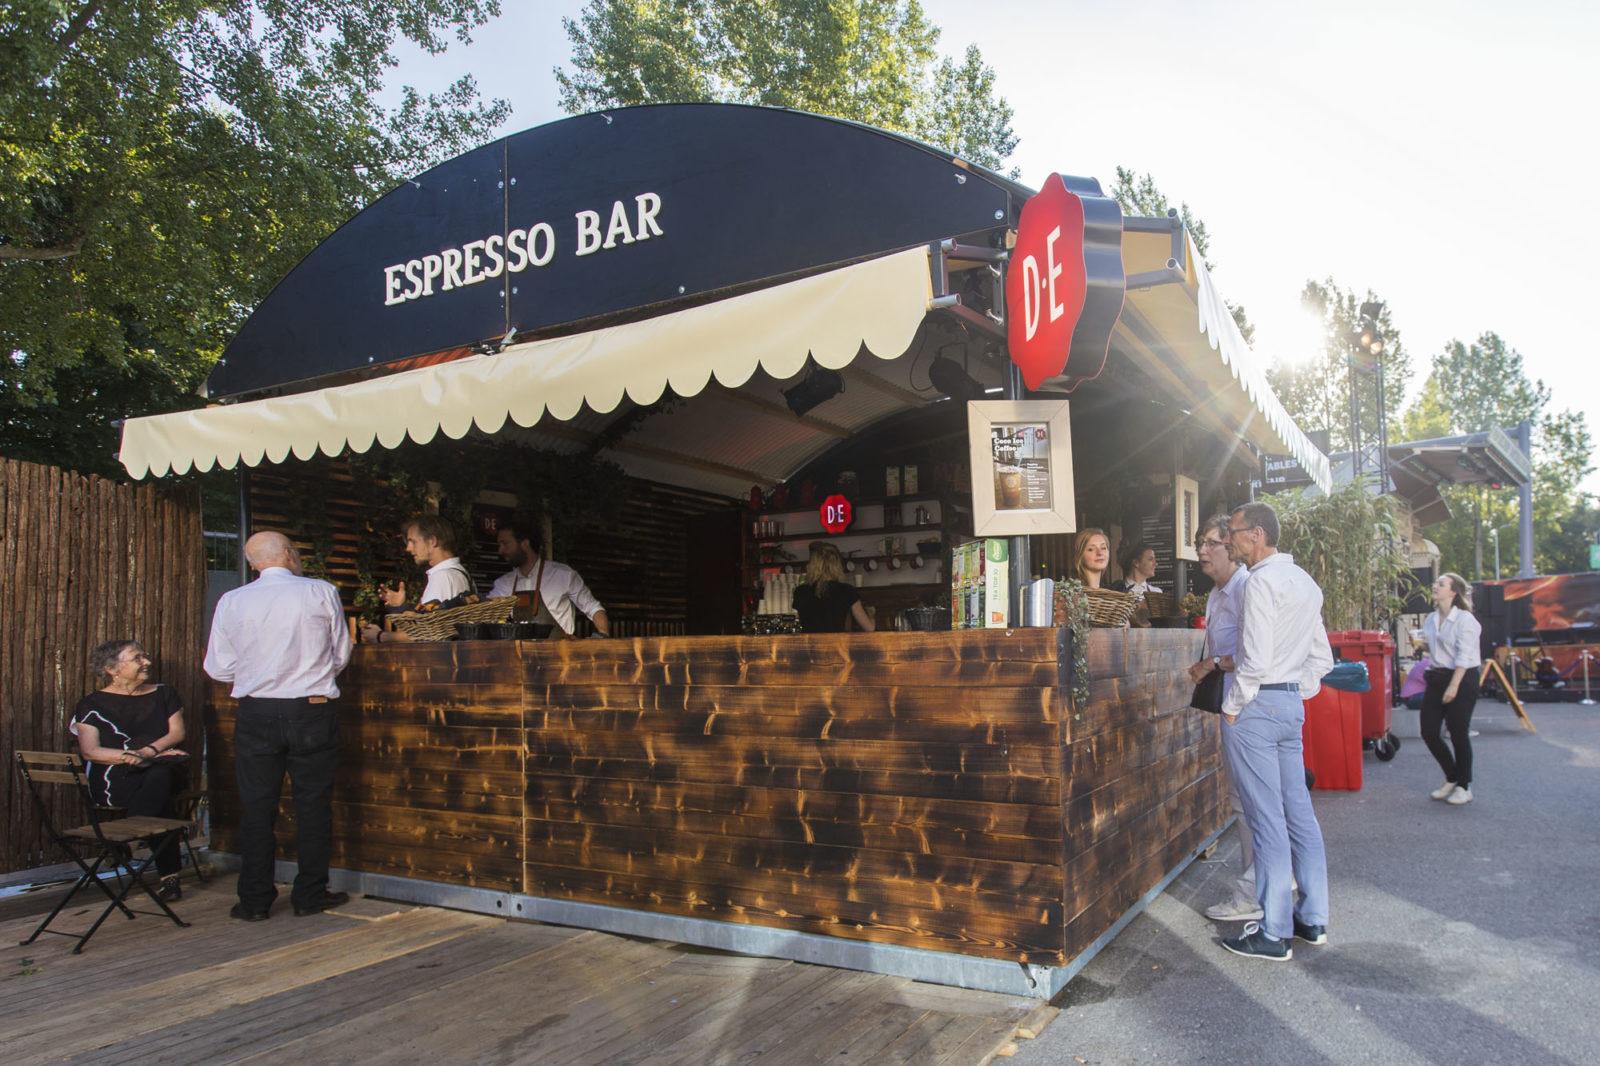 Triomf - Espresso bar at North Sea Jazz festival